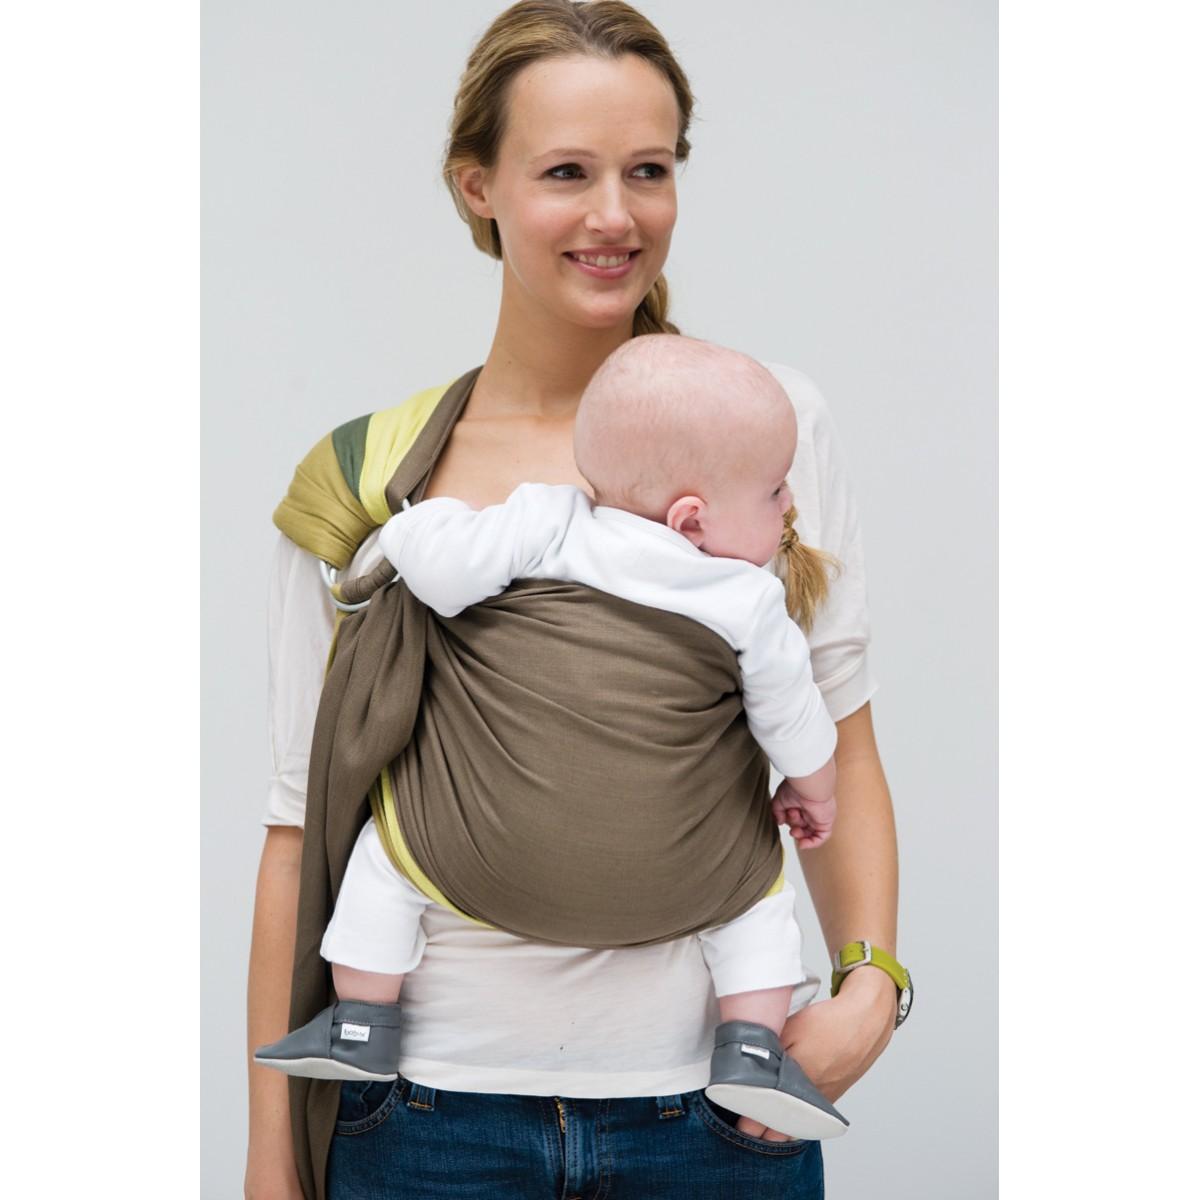 Echarpe porte-bébé BB Sling - padded - 972 - Black Beans. 1 ... 40e1522a22c